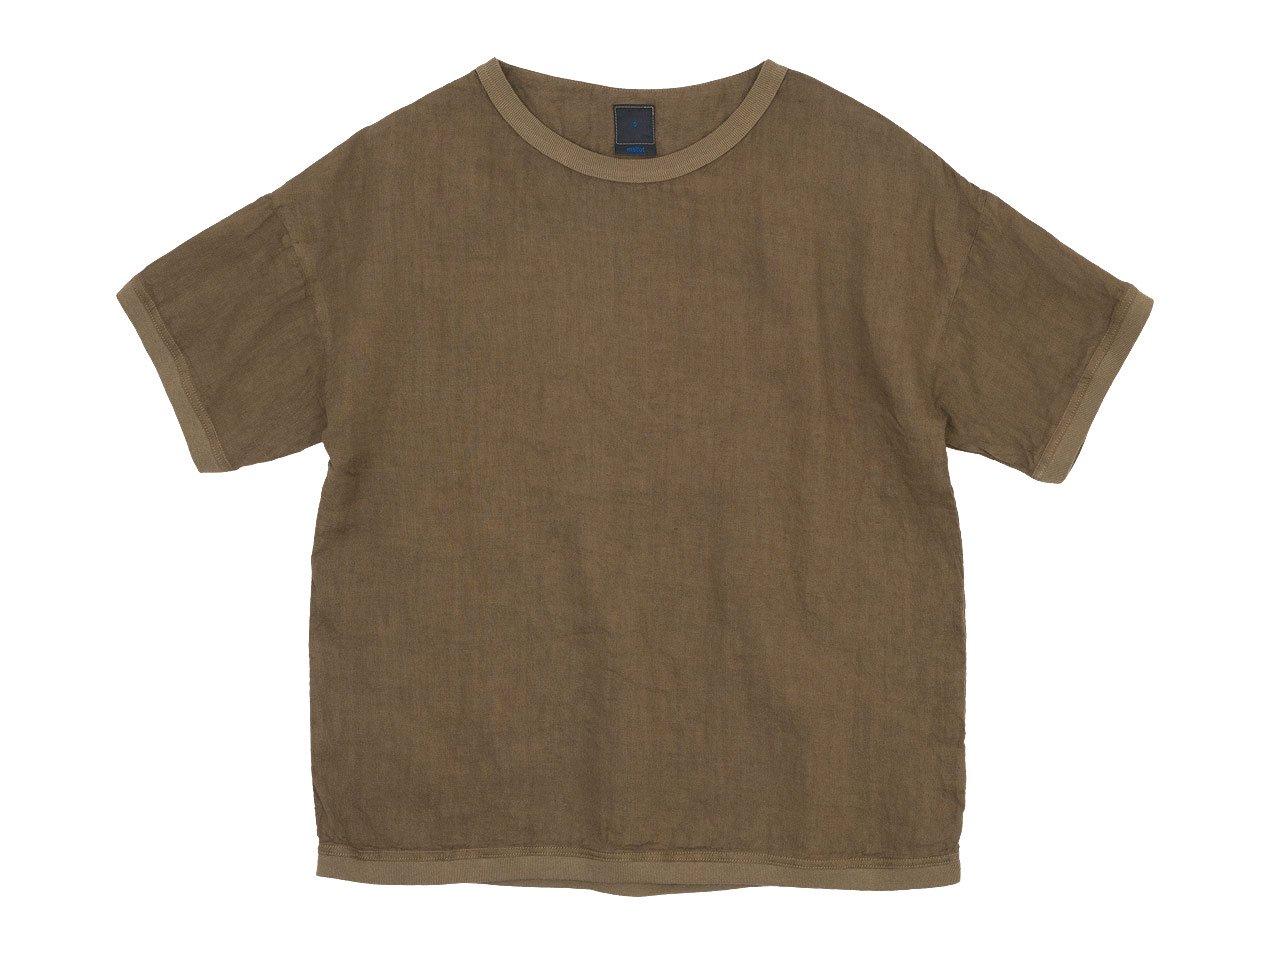 maillot linen shirts Tee BROWN